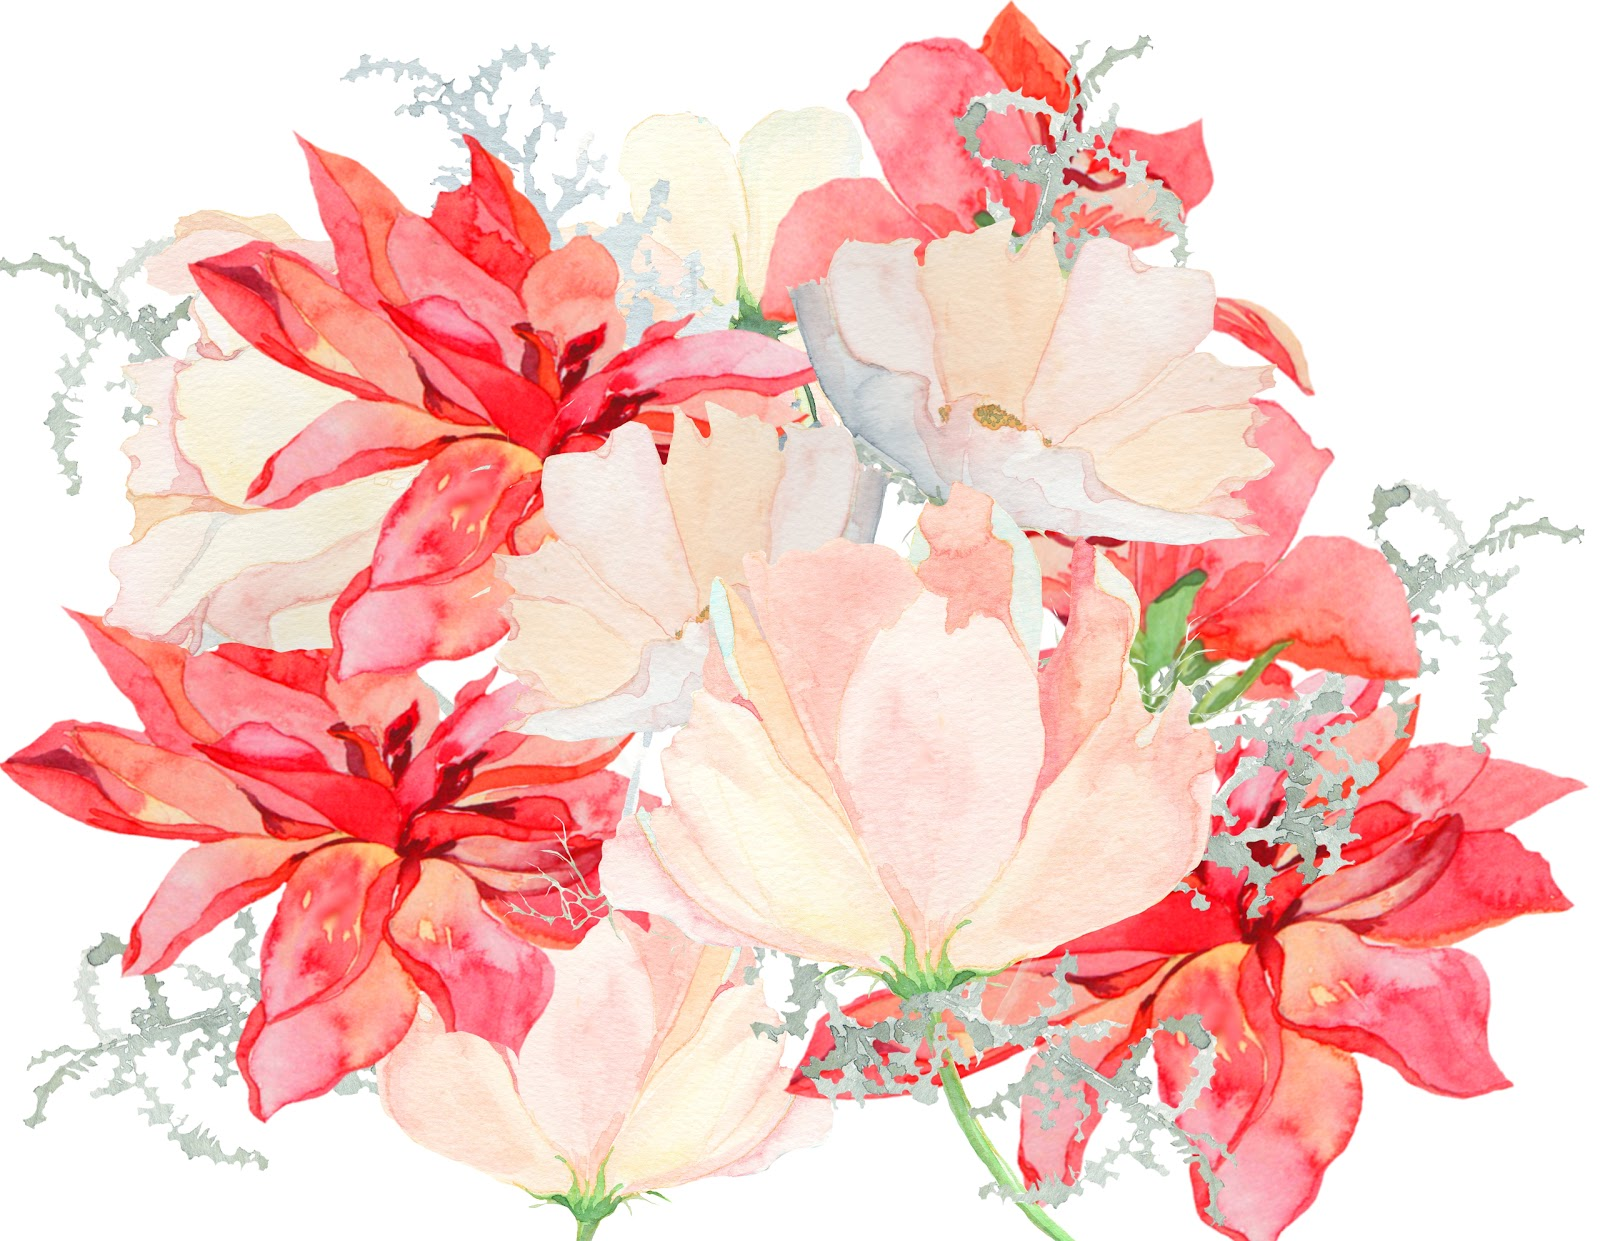 DEEP COVE FLOWERS September 2012